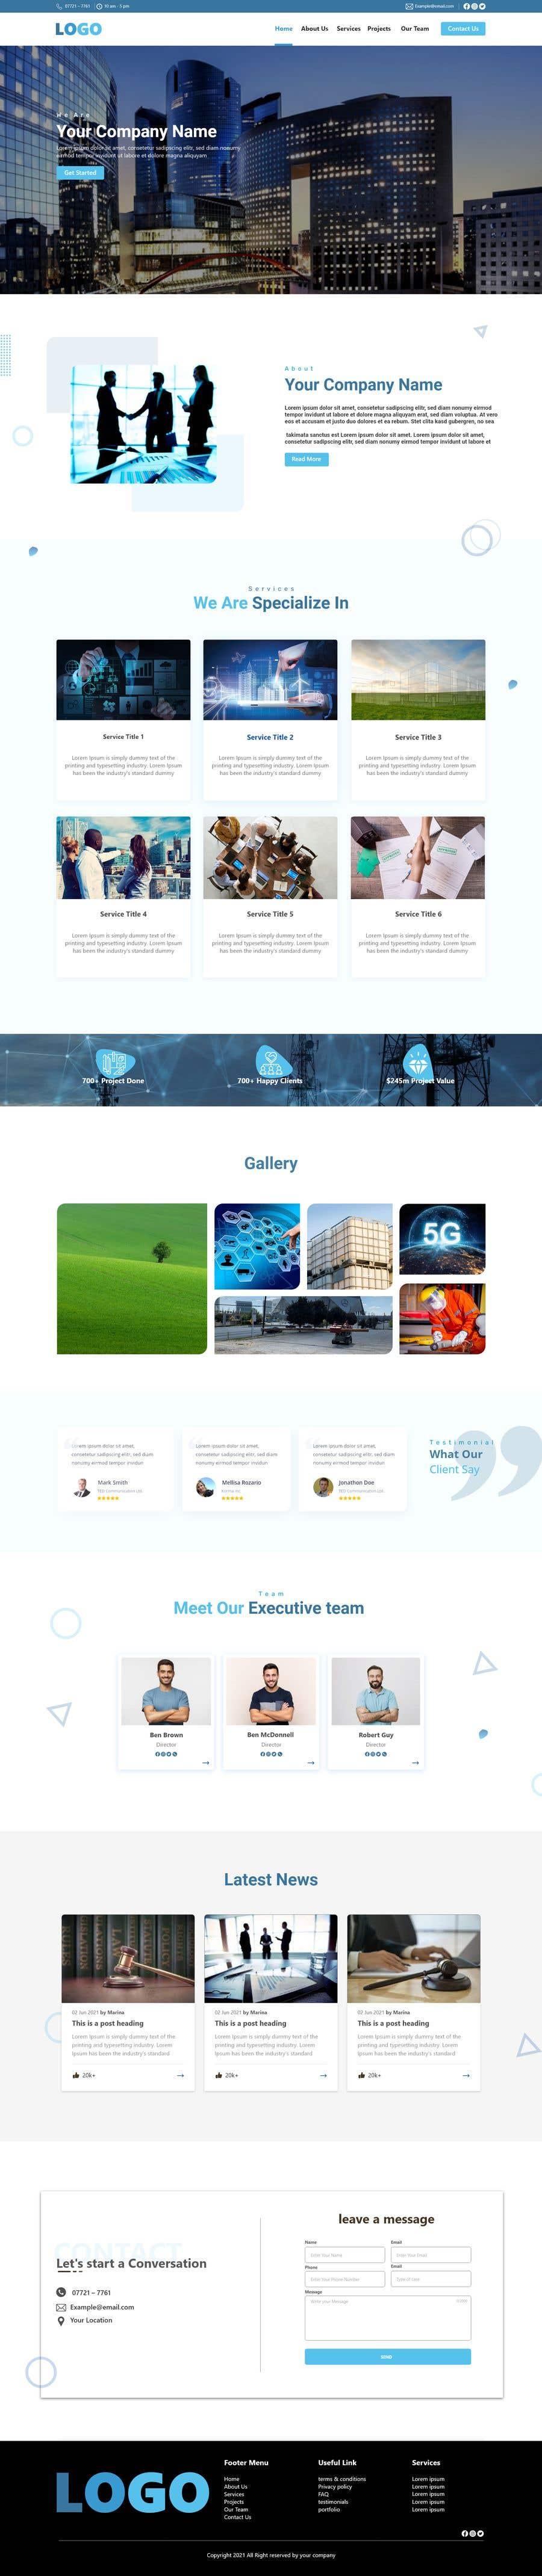 Proposition n°                                        82                                      du concours                                         Website Design for a company page